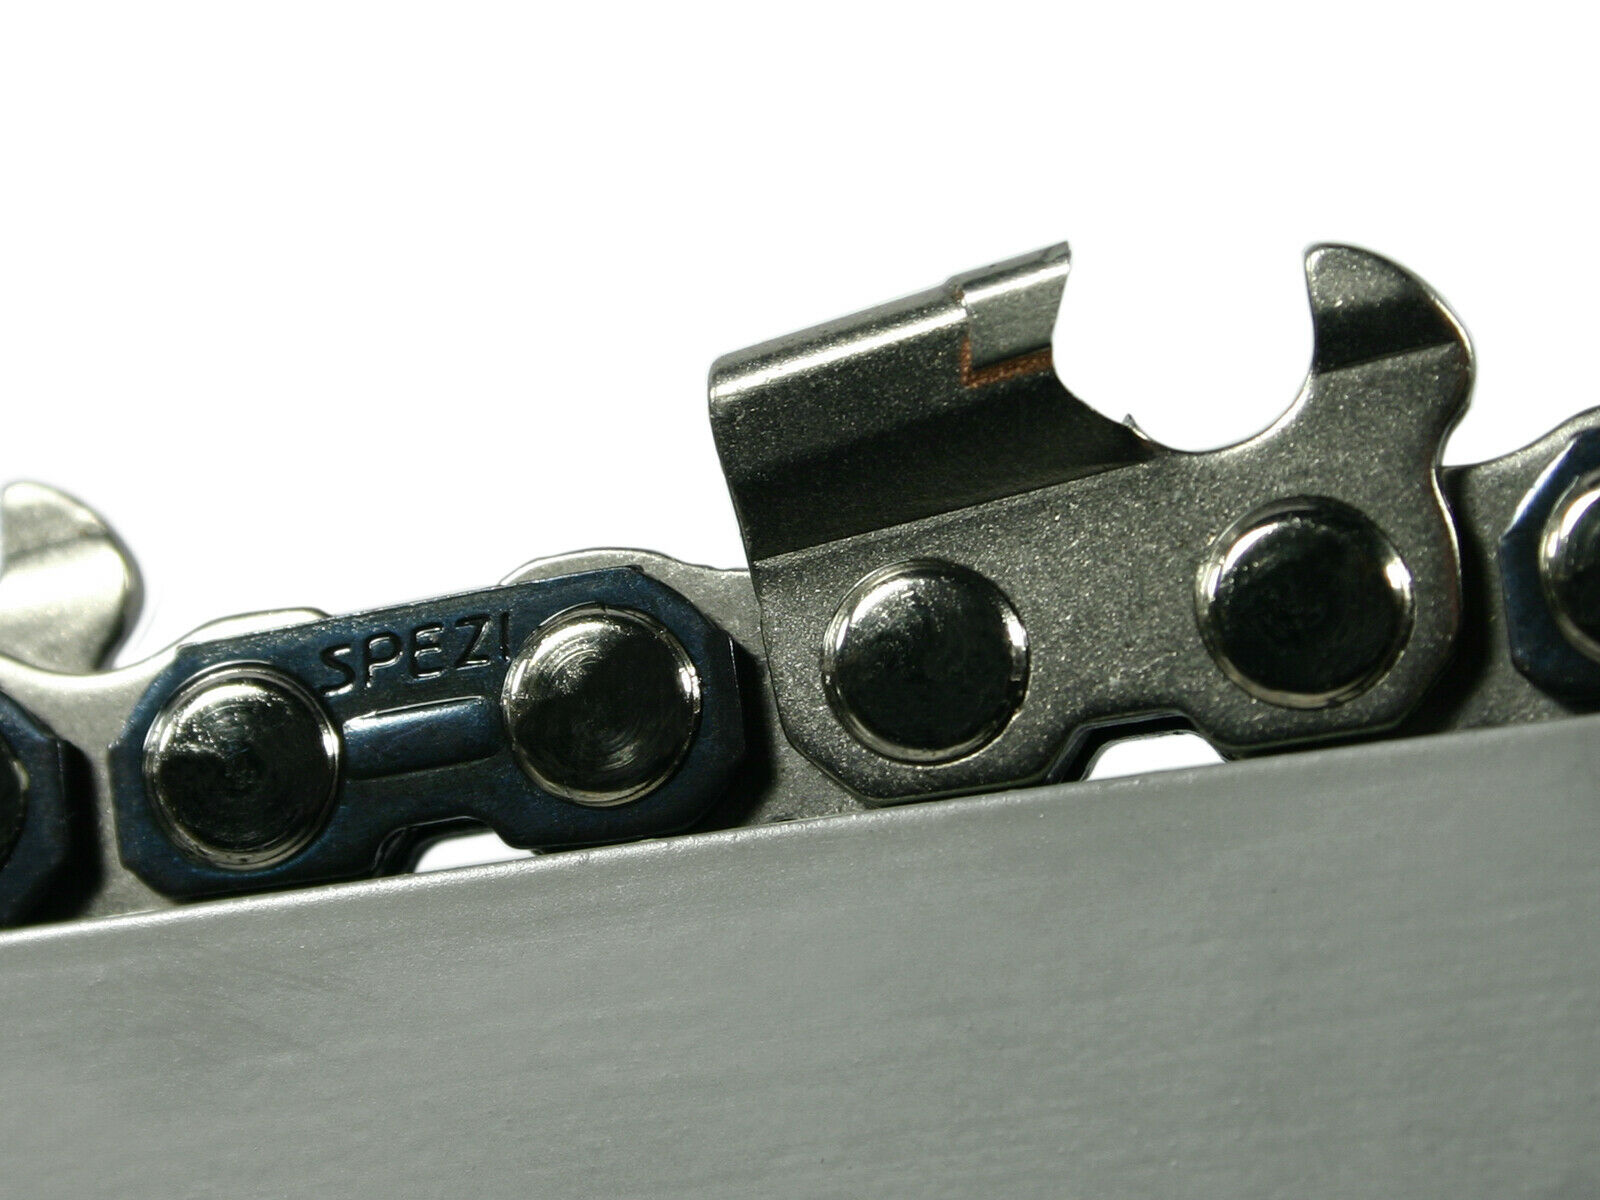 Metal duro cadena sierra adecuado para Husqvarna 576 XP 60 cm 3 8  84 TG 1,5 mm Chain